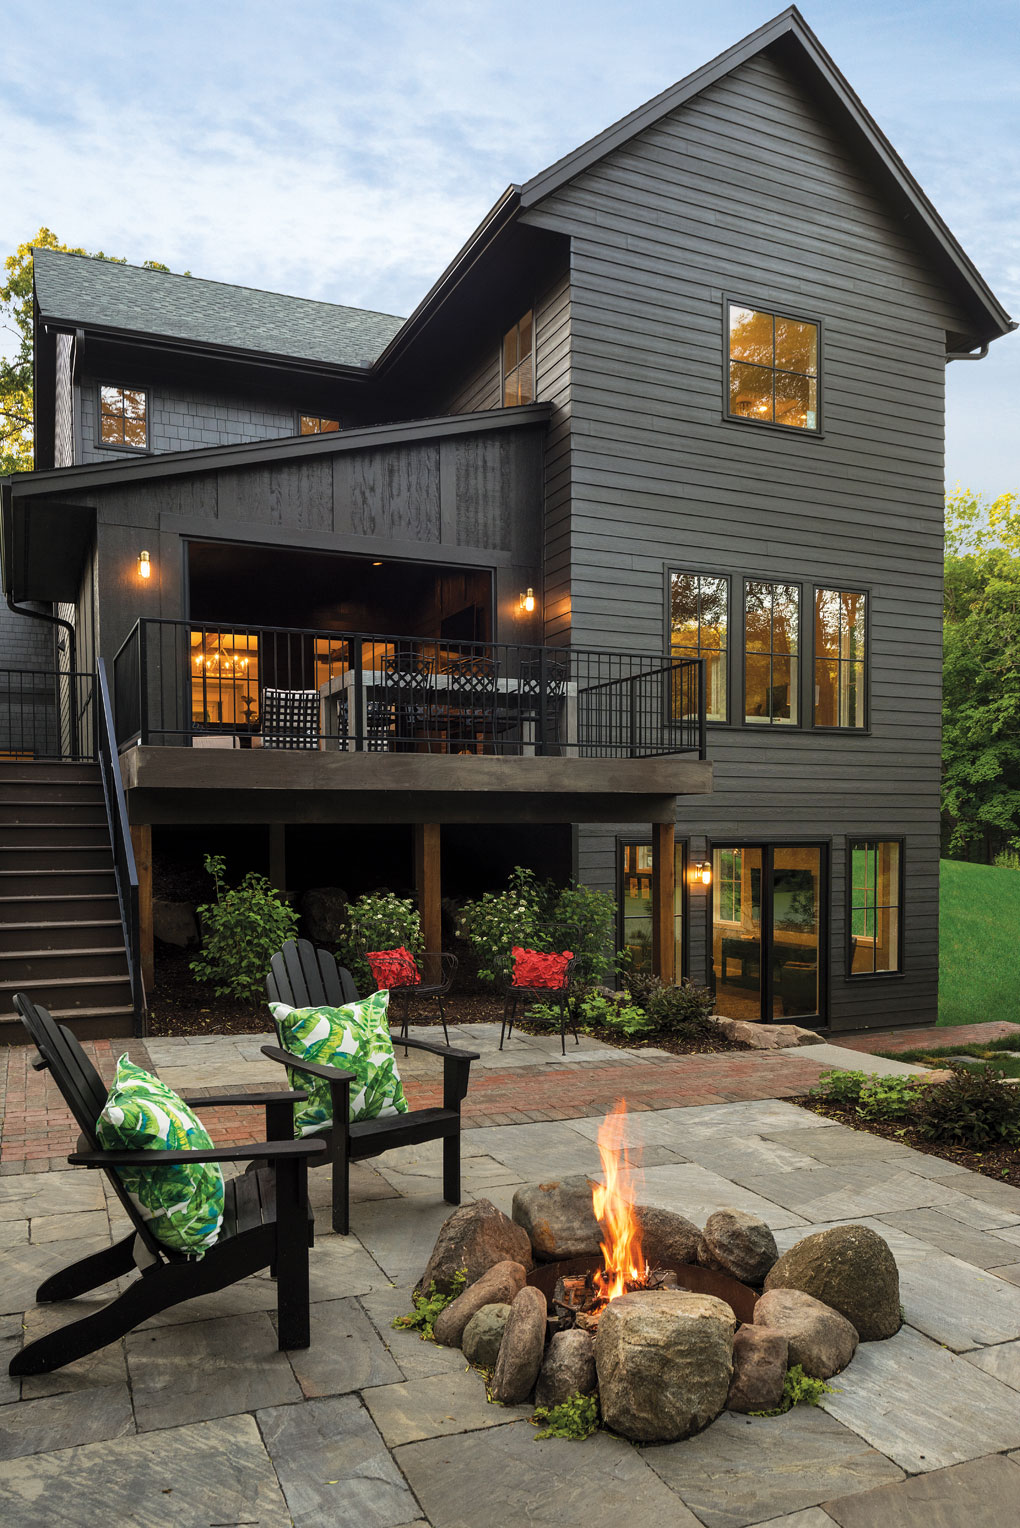 A stone fire pit accents a brick patio.